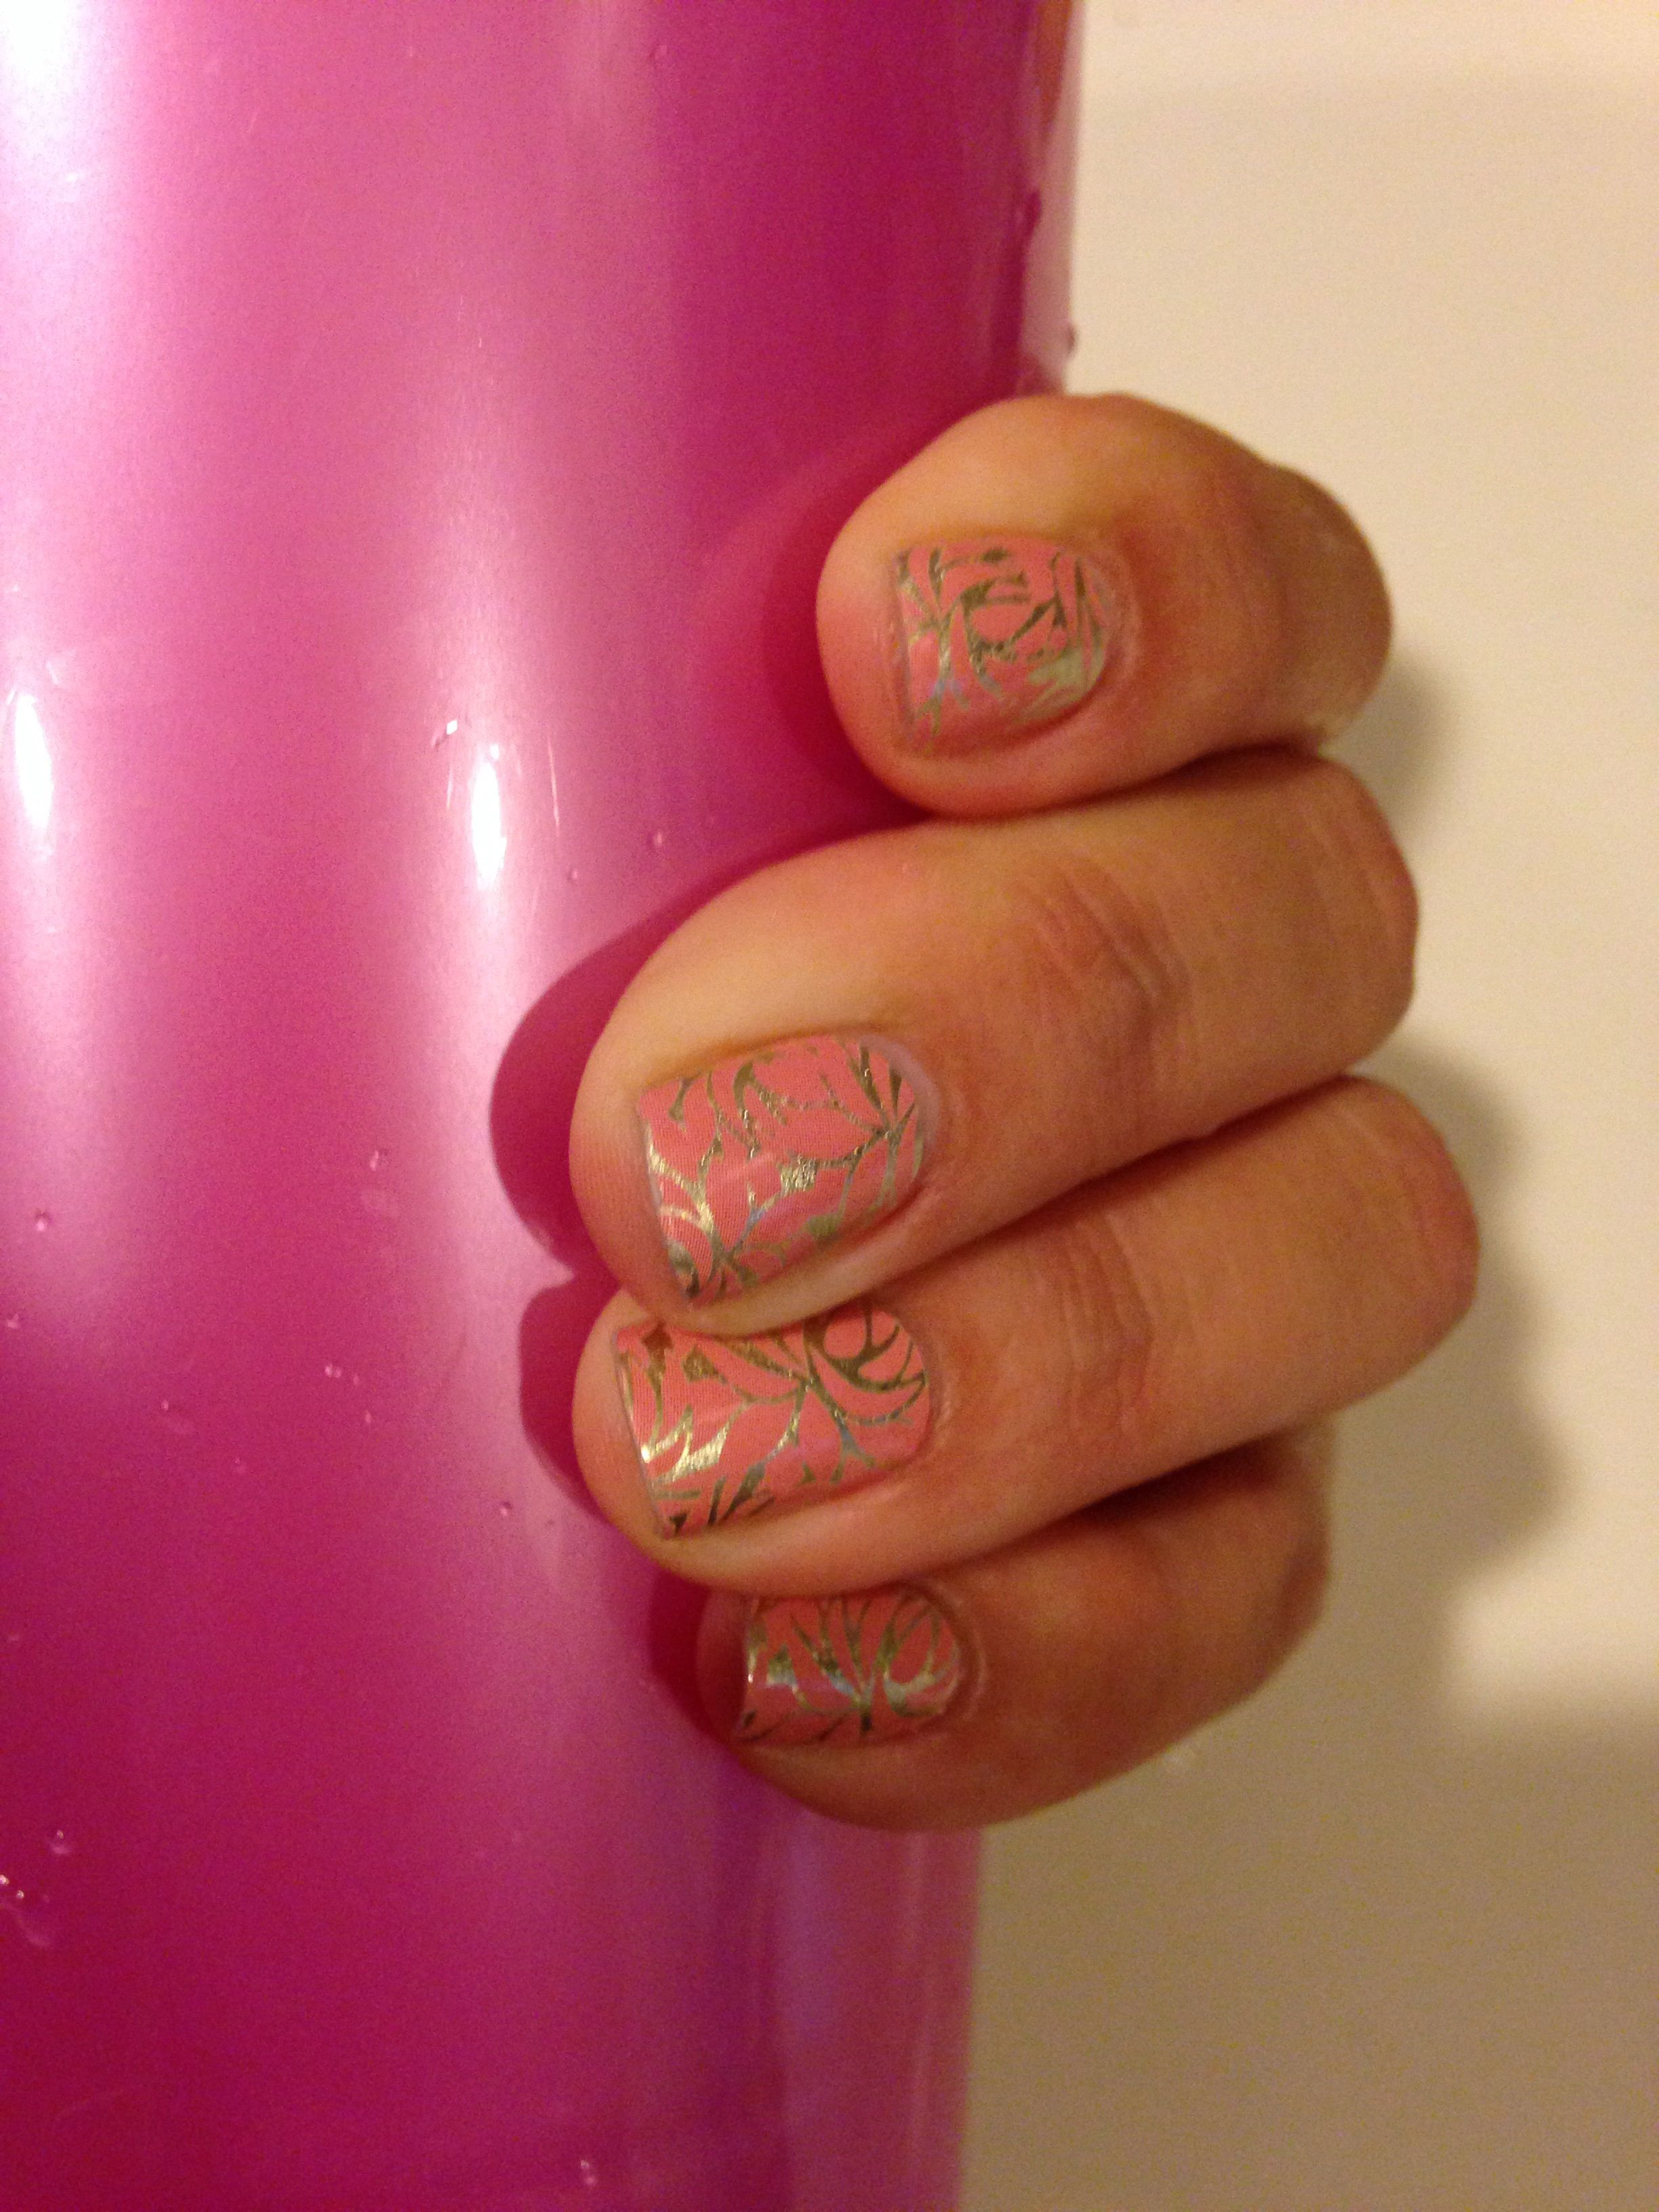 Love fern nail art for short nails do it yourself nails nails nail art for short nails do it yourself nails solutioingenieria Images